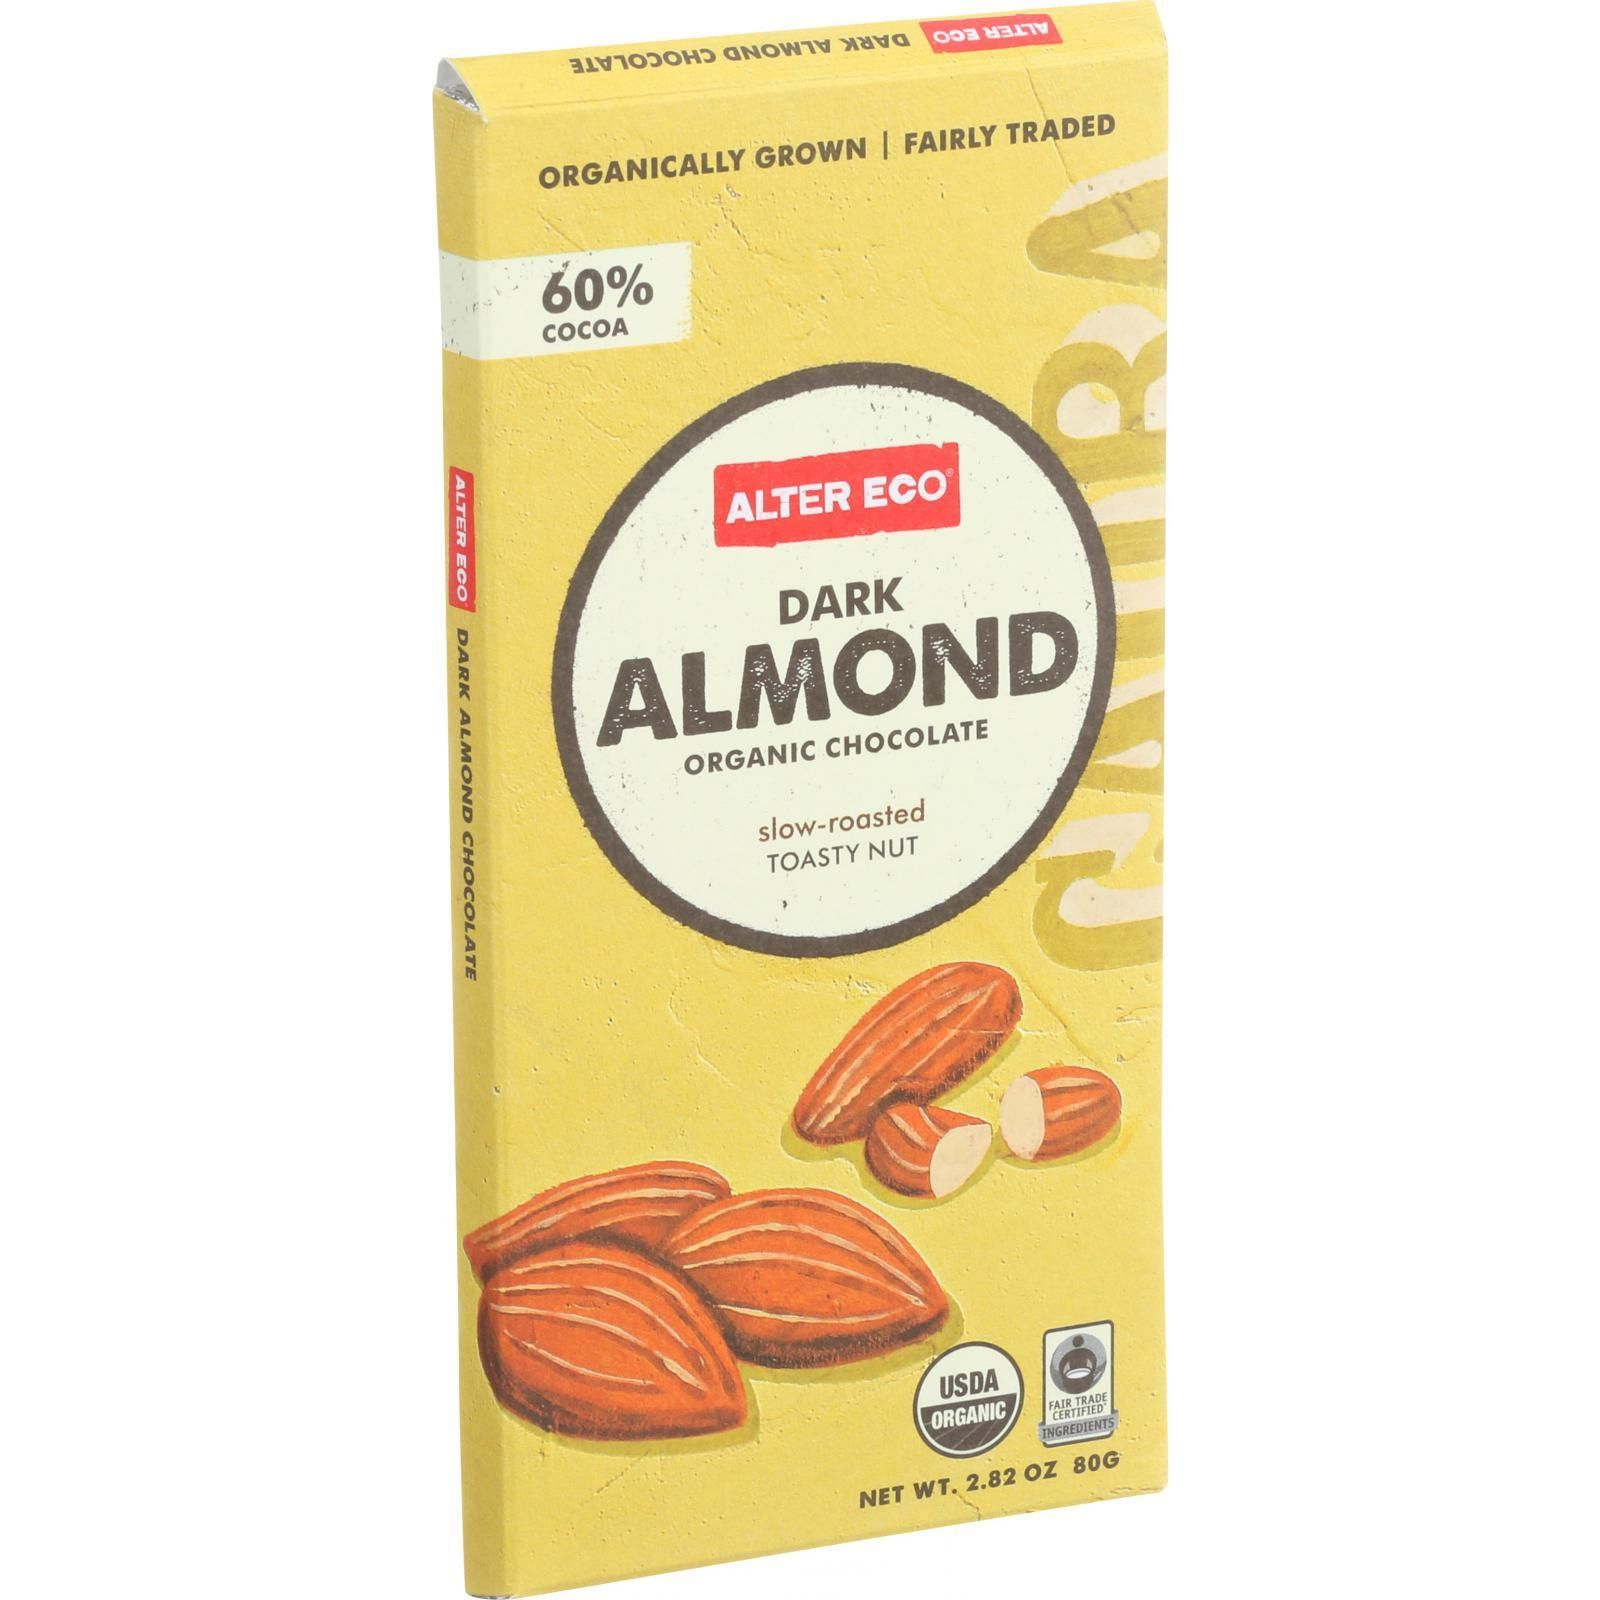 Alter Eco Americas Organic Chocolate Bar - Dark Almond - 2.82 oz Bars - Case of 12